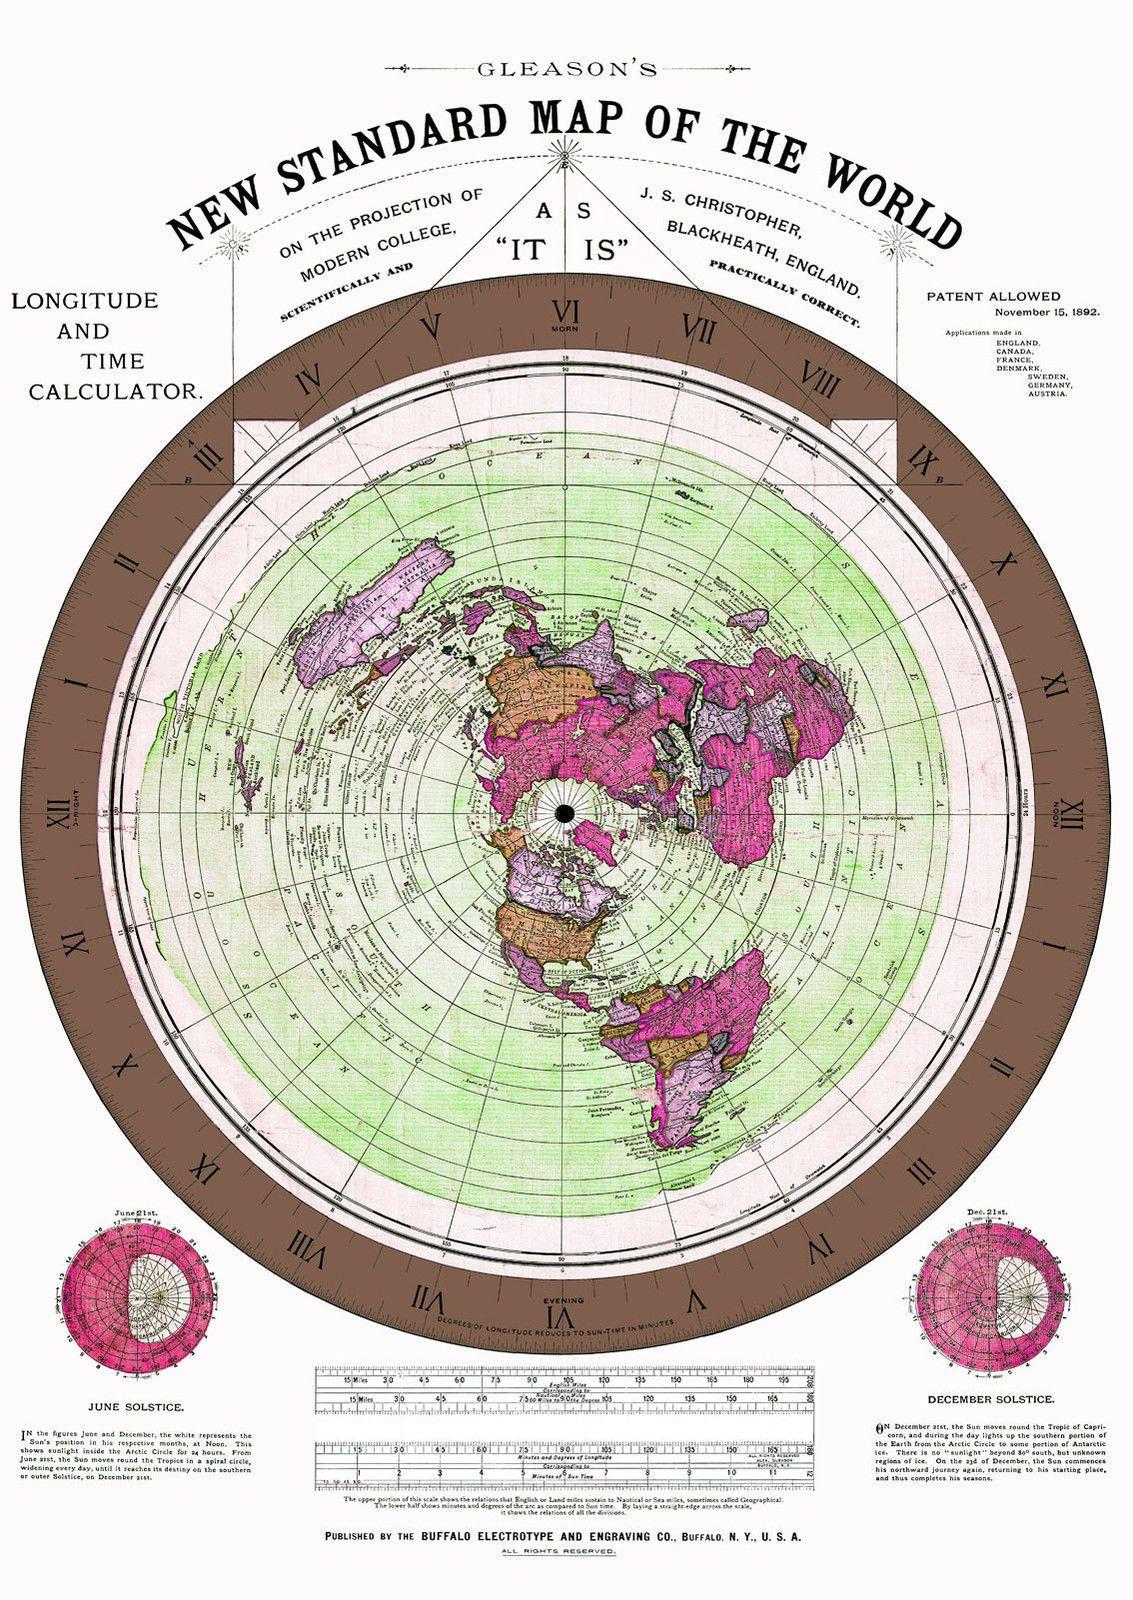 $14.0   Flat Earth Map Alexander Gleason   1892 Gleason's Standard